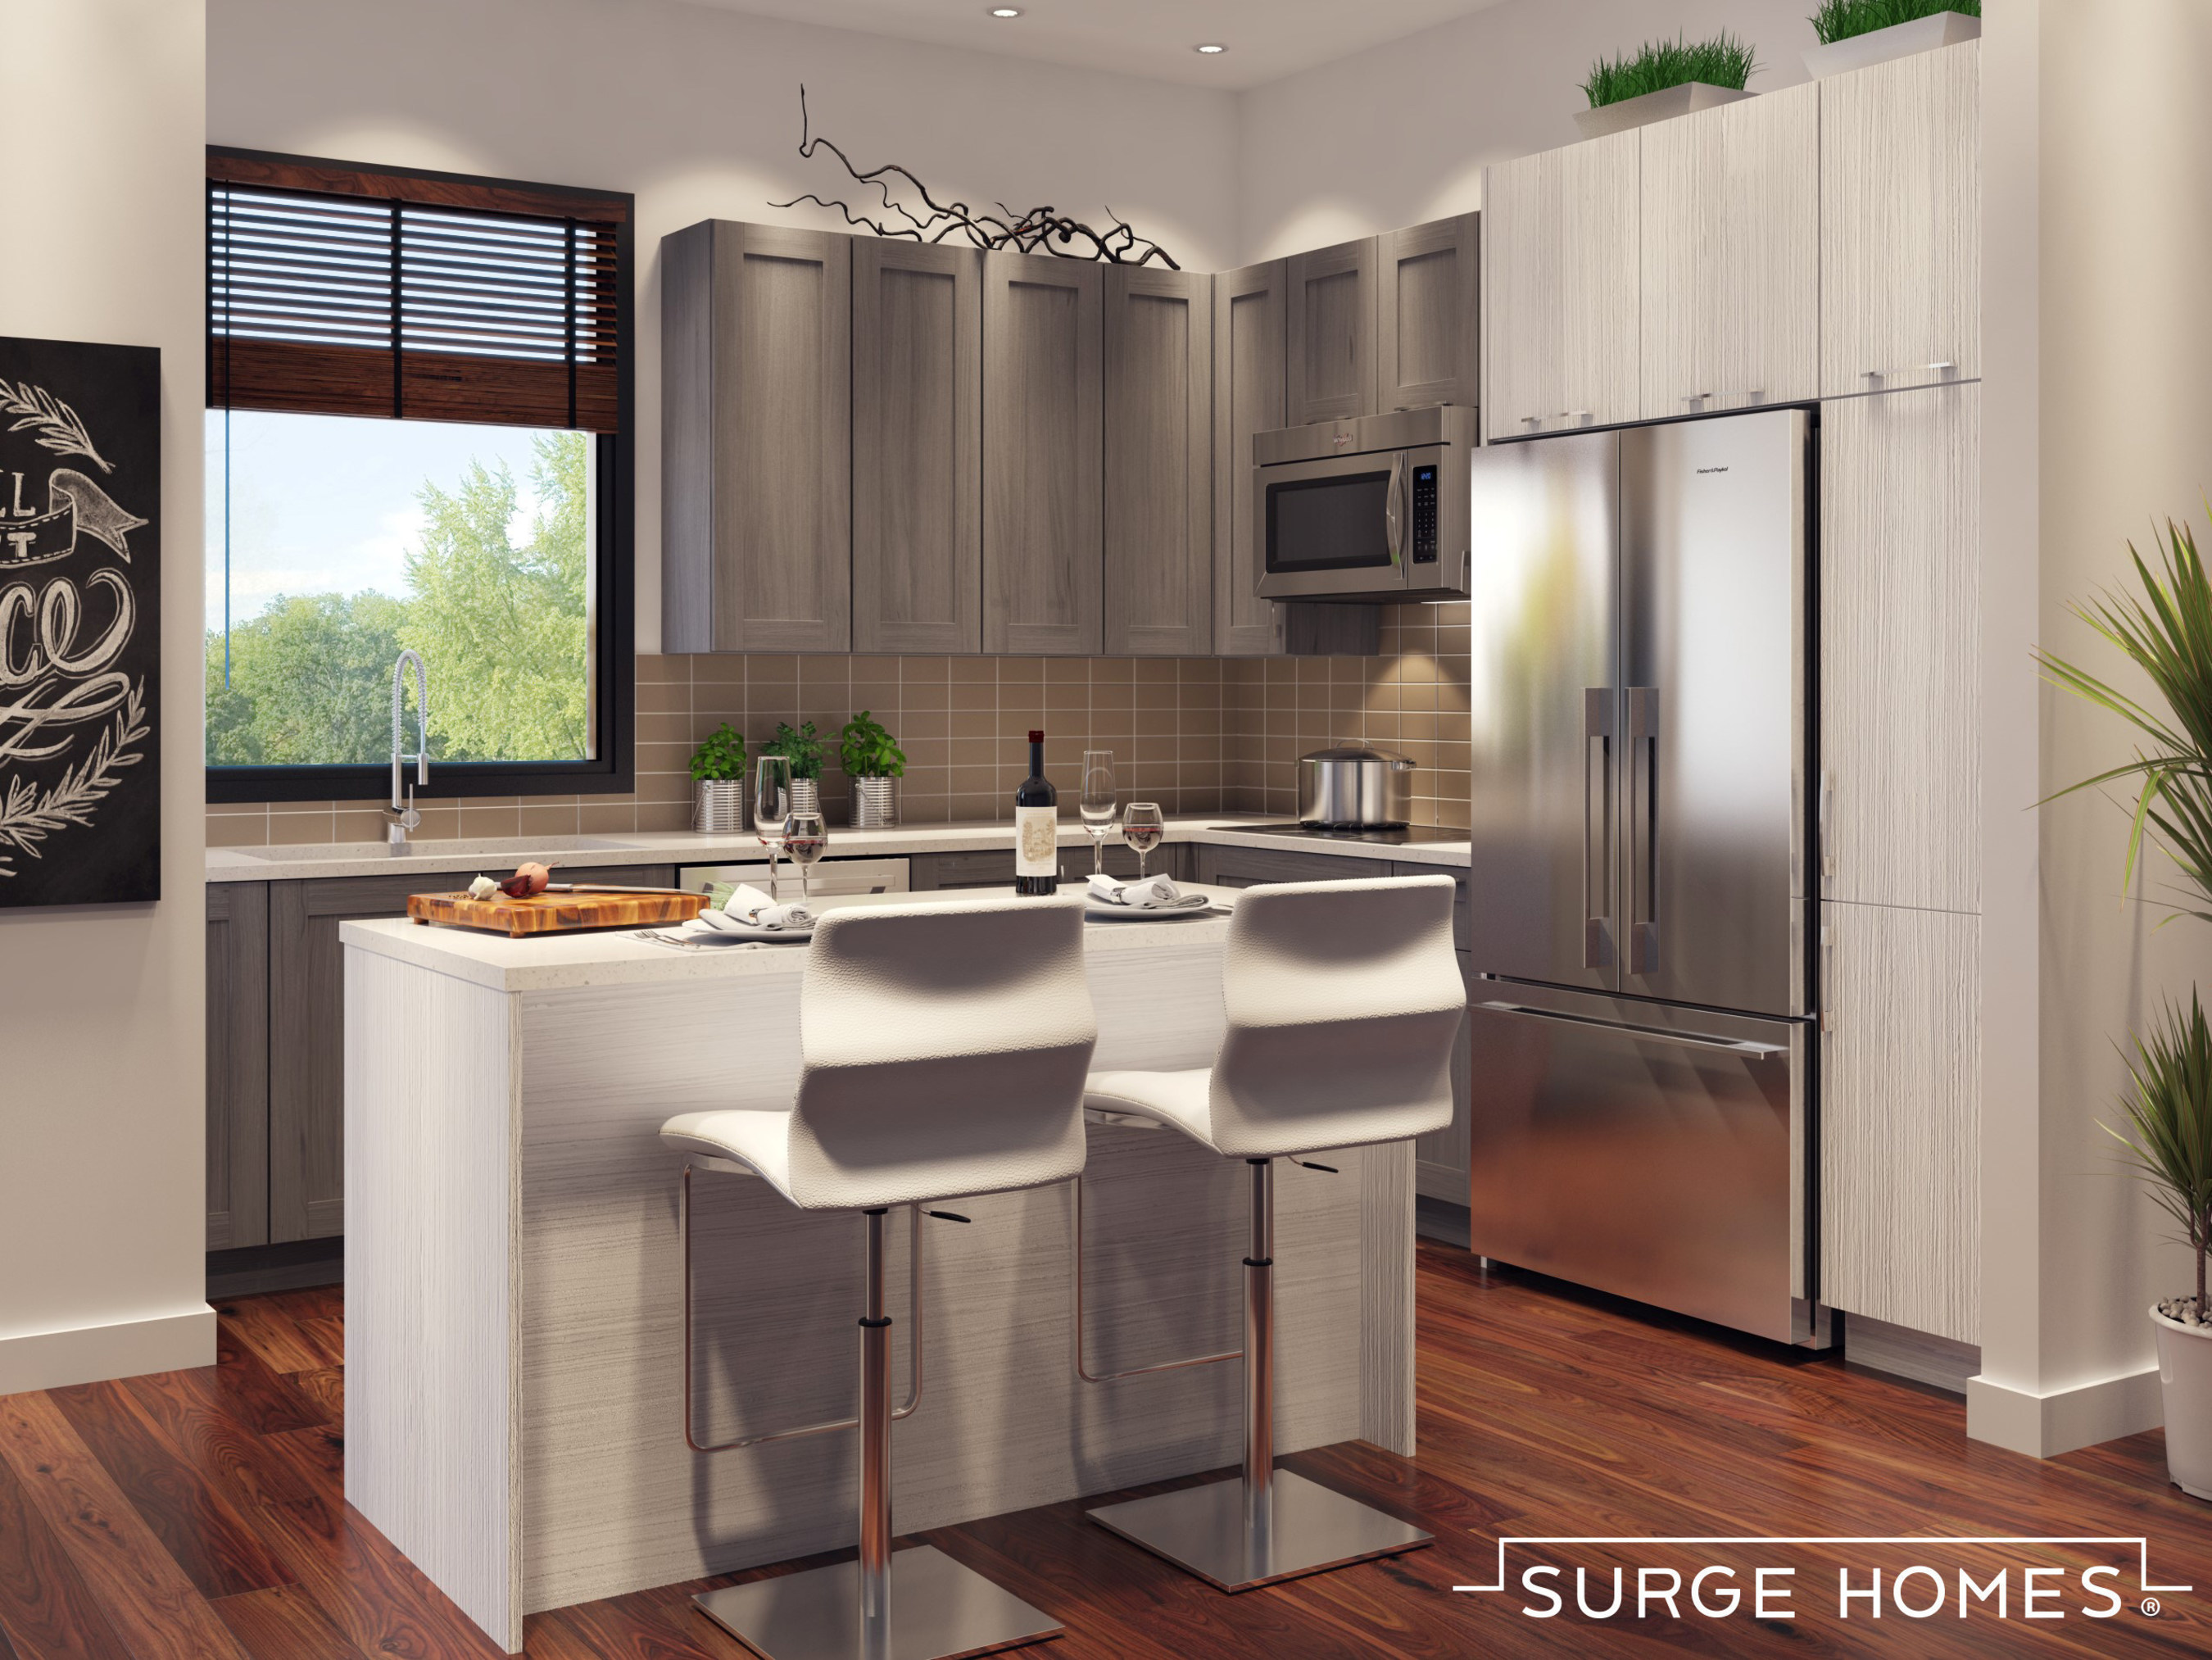 New Homes Interior Design Match Made In Heaven - Crowdsourcing interior design